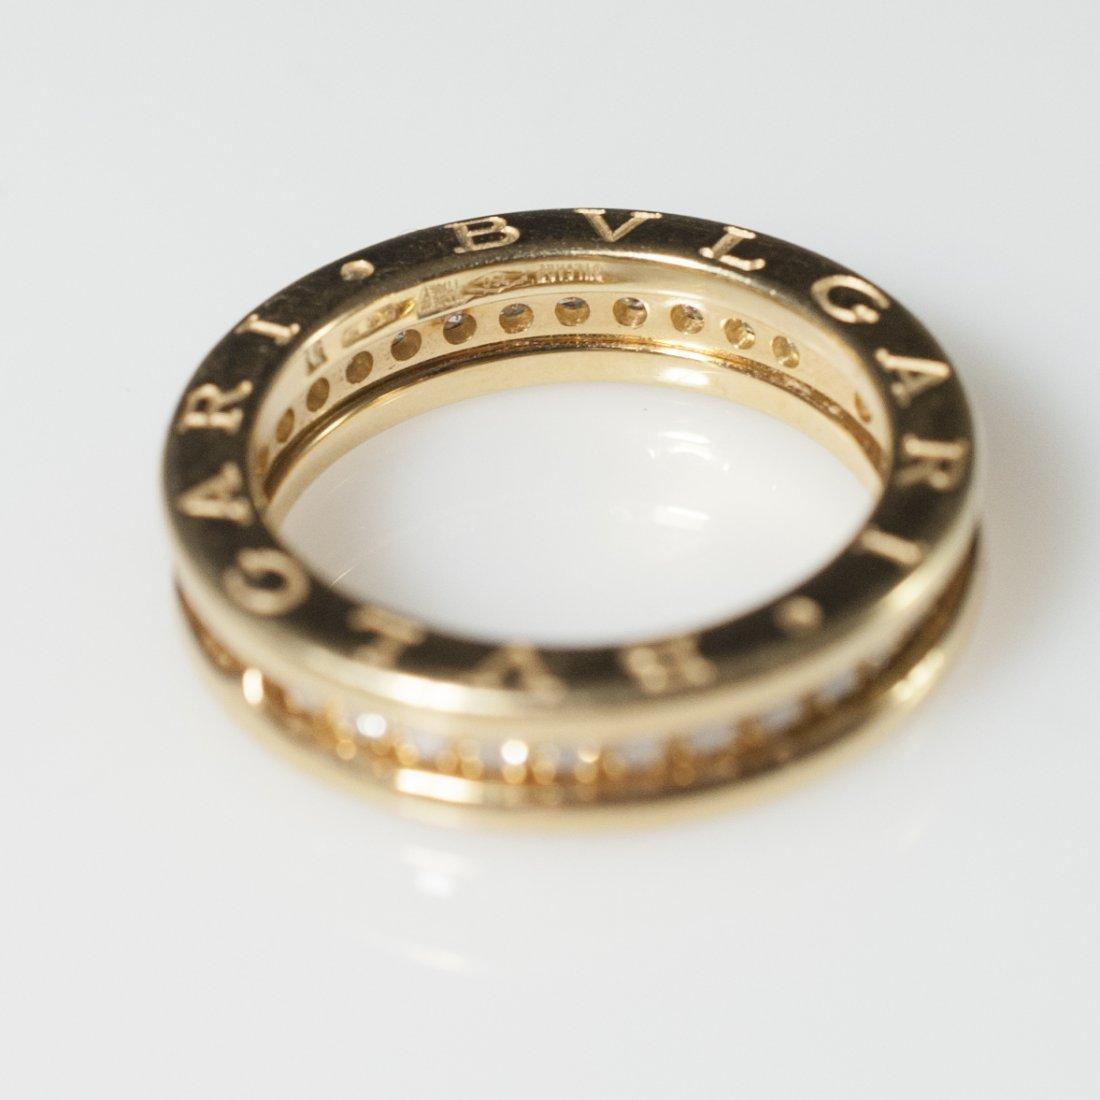 Bvlgari 18kt Gold & Diamond Wedding Band - 2